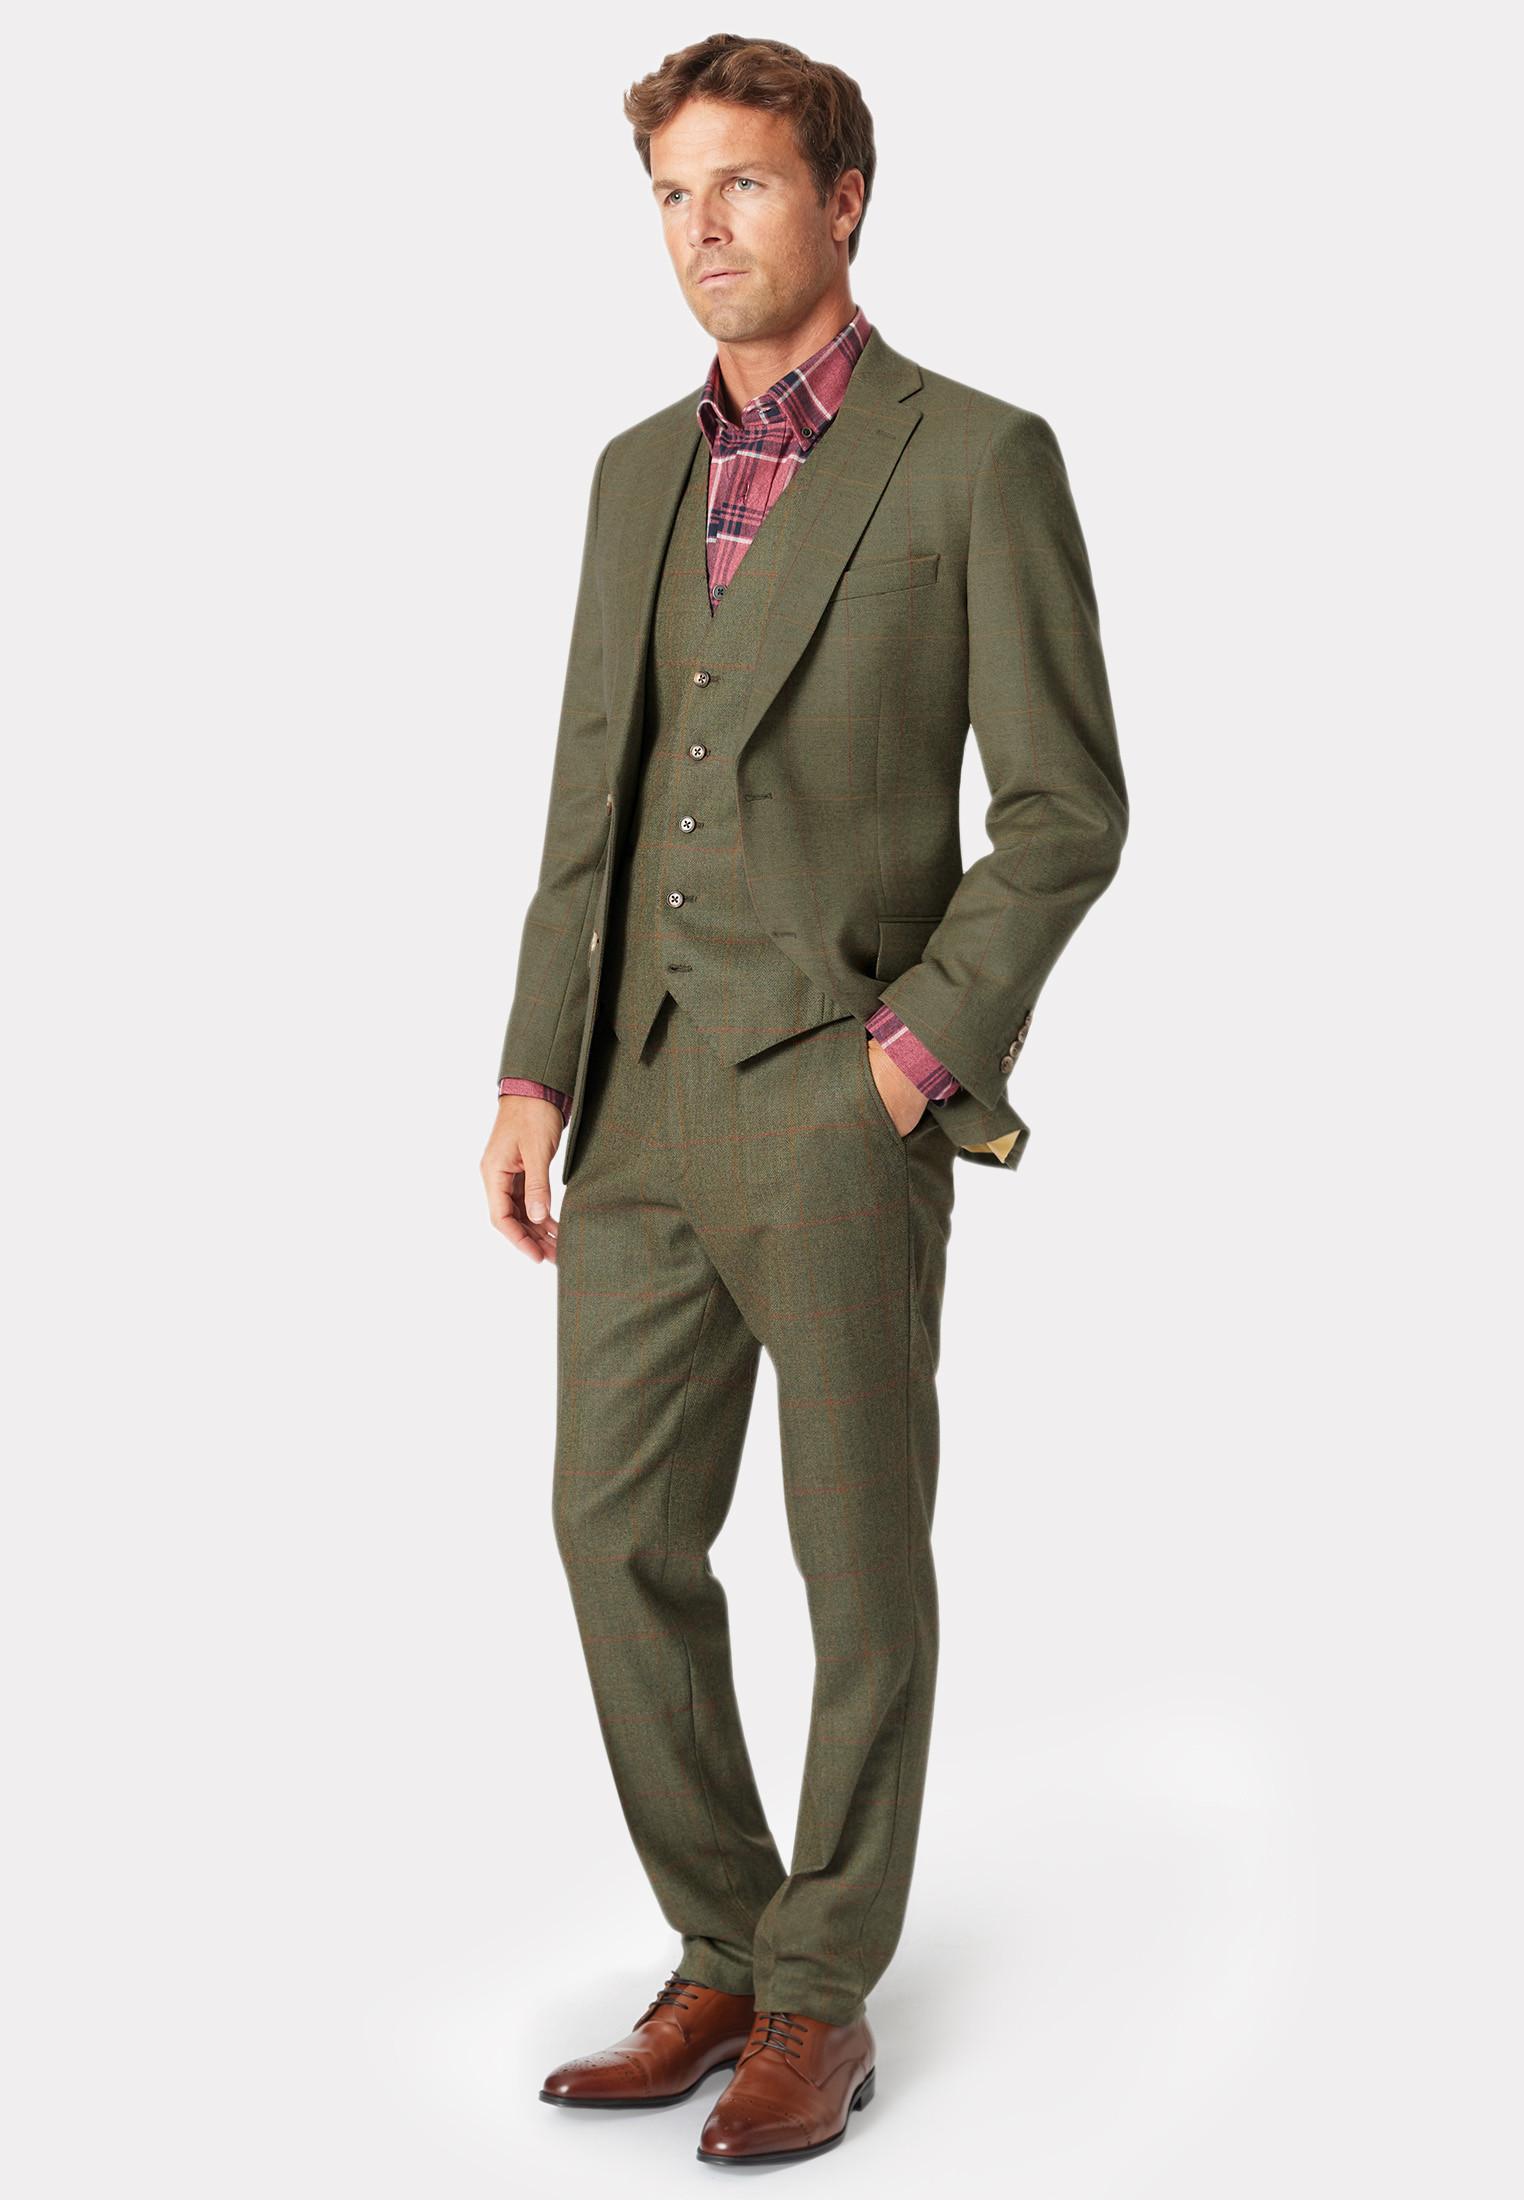 Dalton Tweed Three Piece Suit - Waistcoat Optional